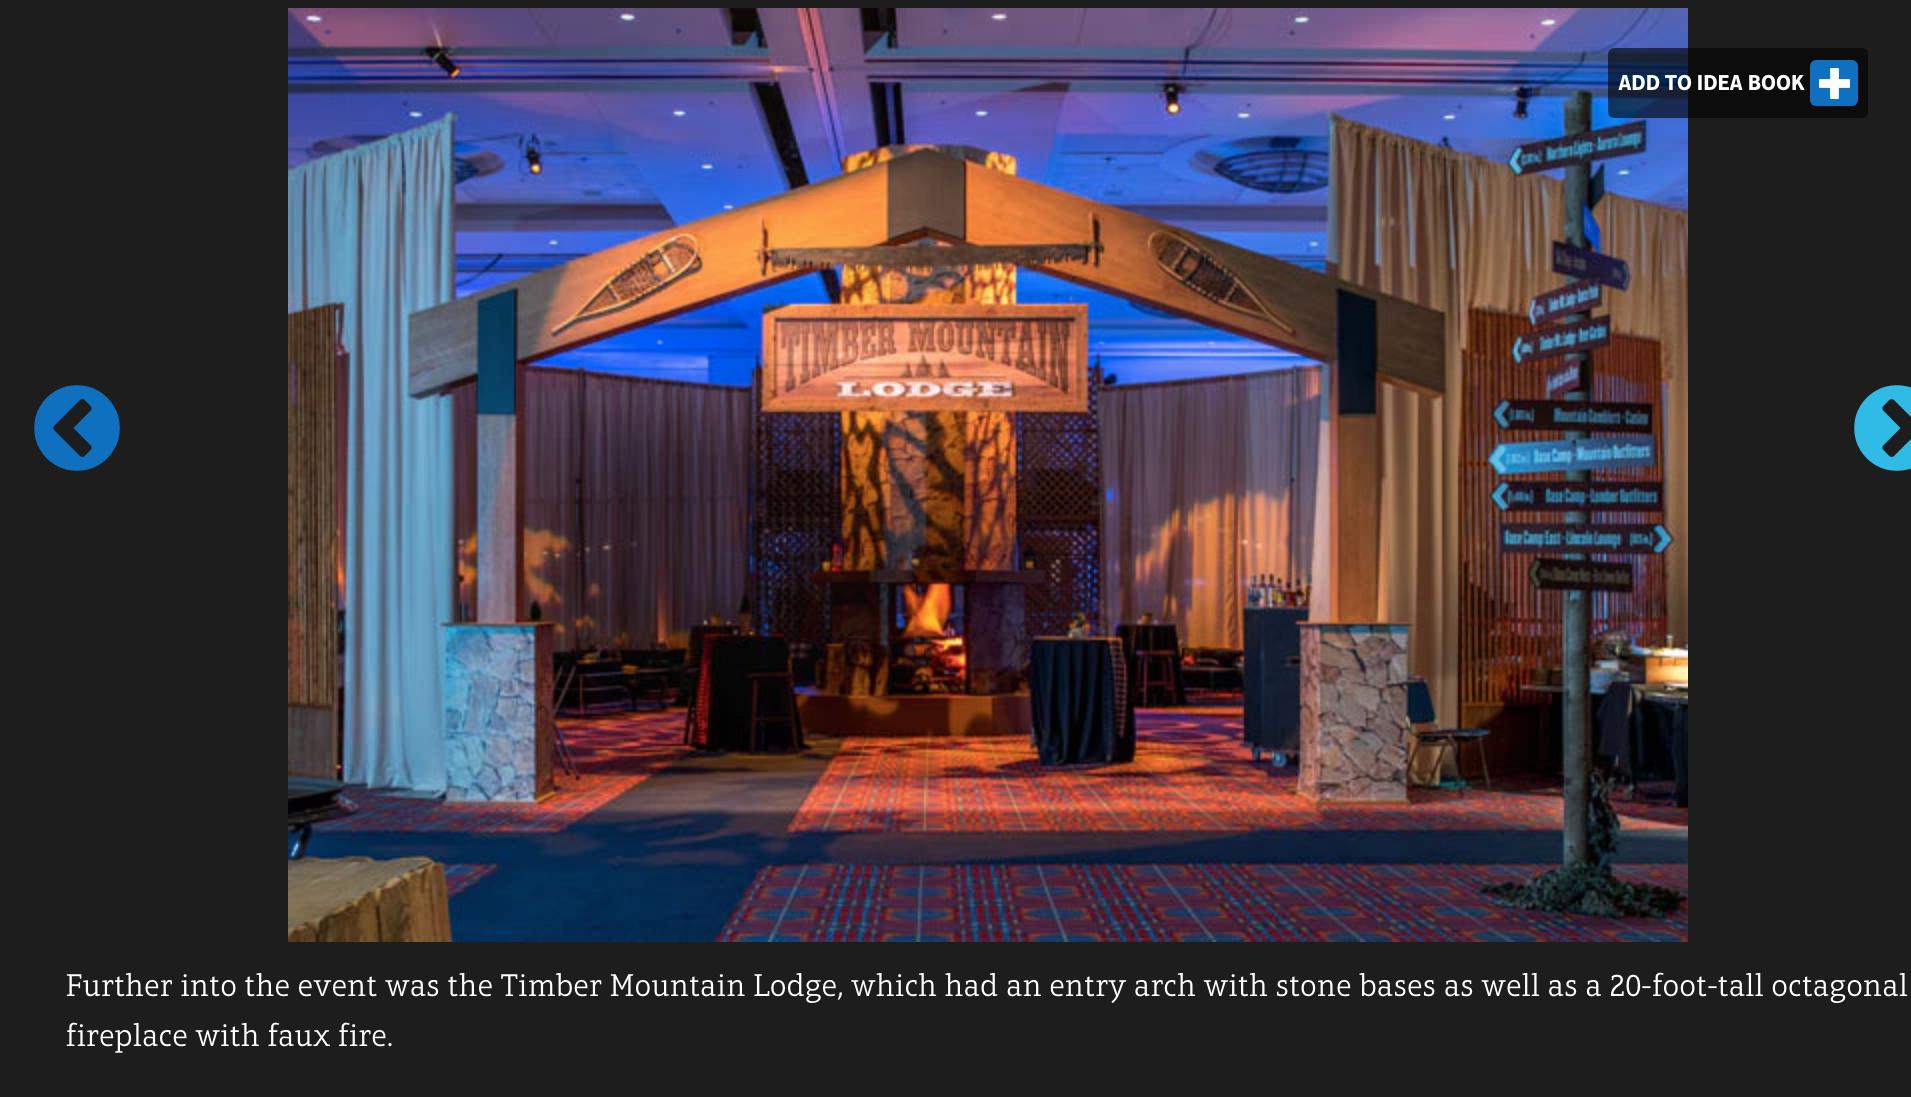 Ski Lodge Winter Themed Event Corporate Event Design Corporate Events Decoration Lounge Design